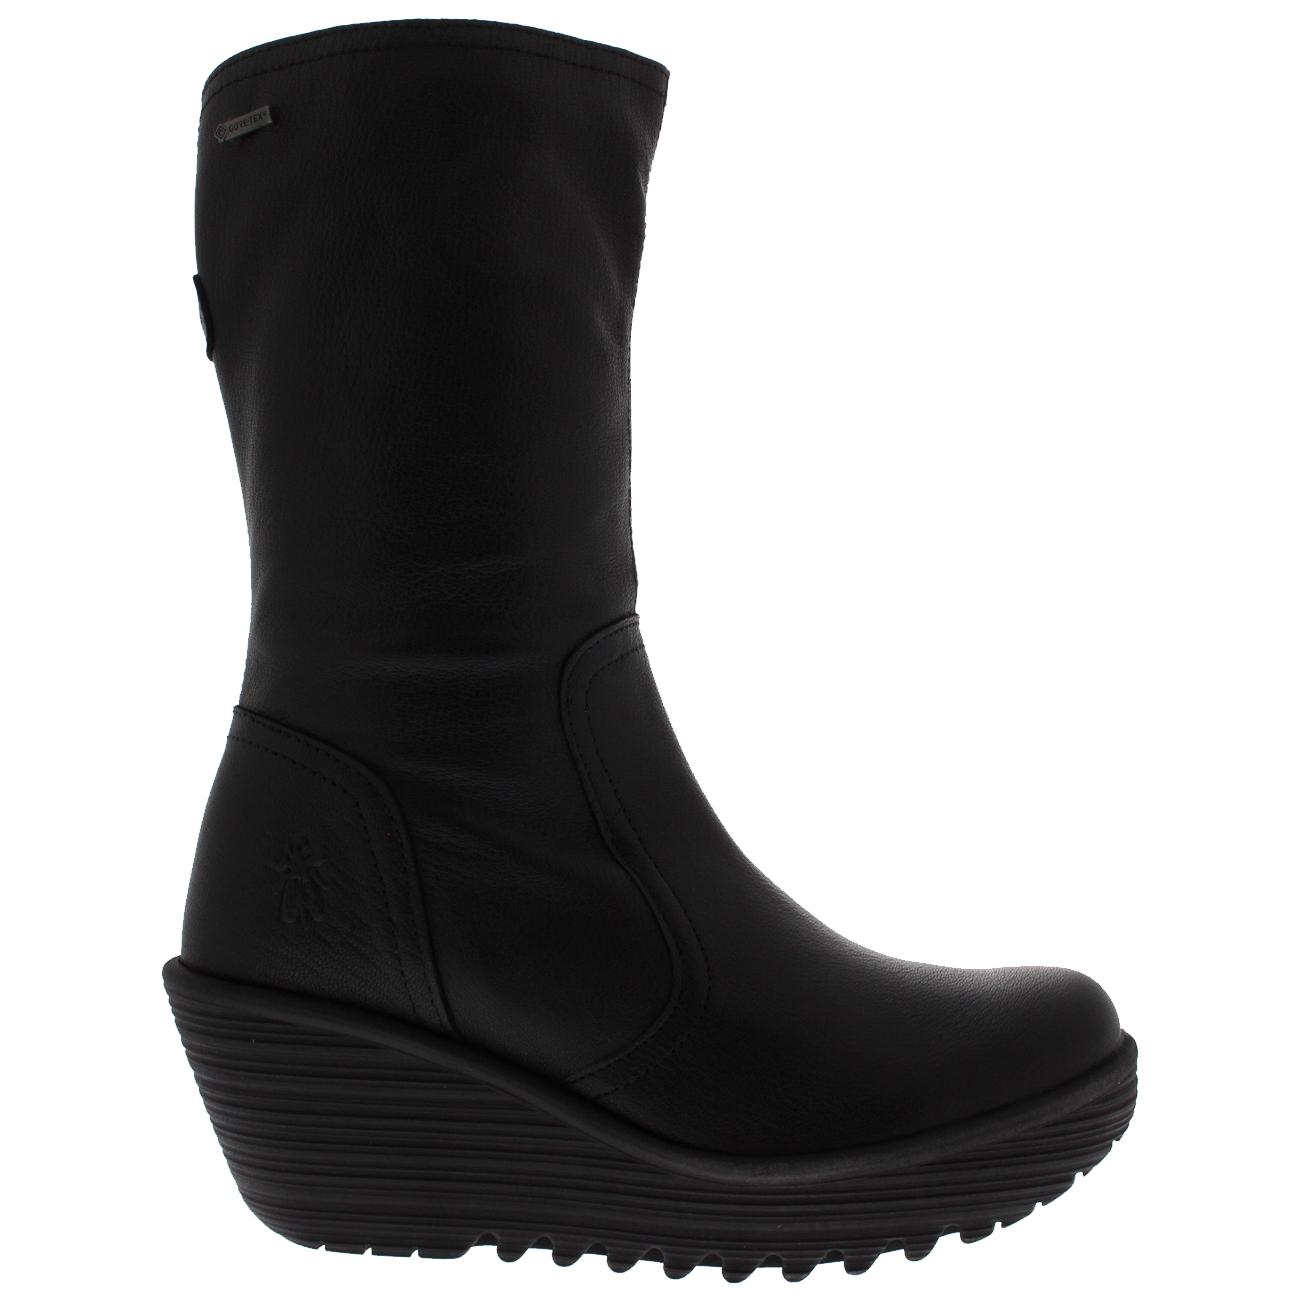 4304cc3edc4 Womens Fly London Yups Warm Black Wedge Heel Winter Mid Calf Leather Boot 5- 11